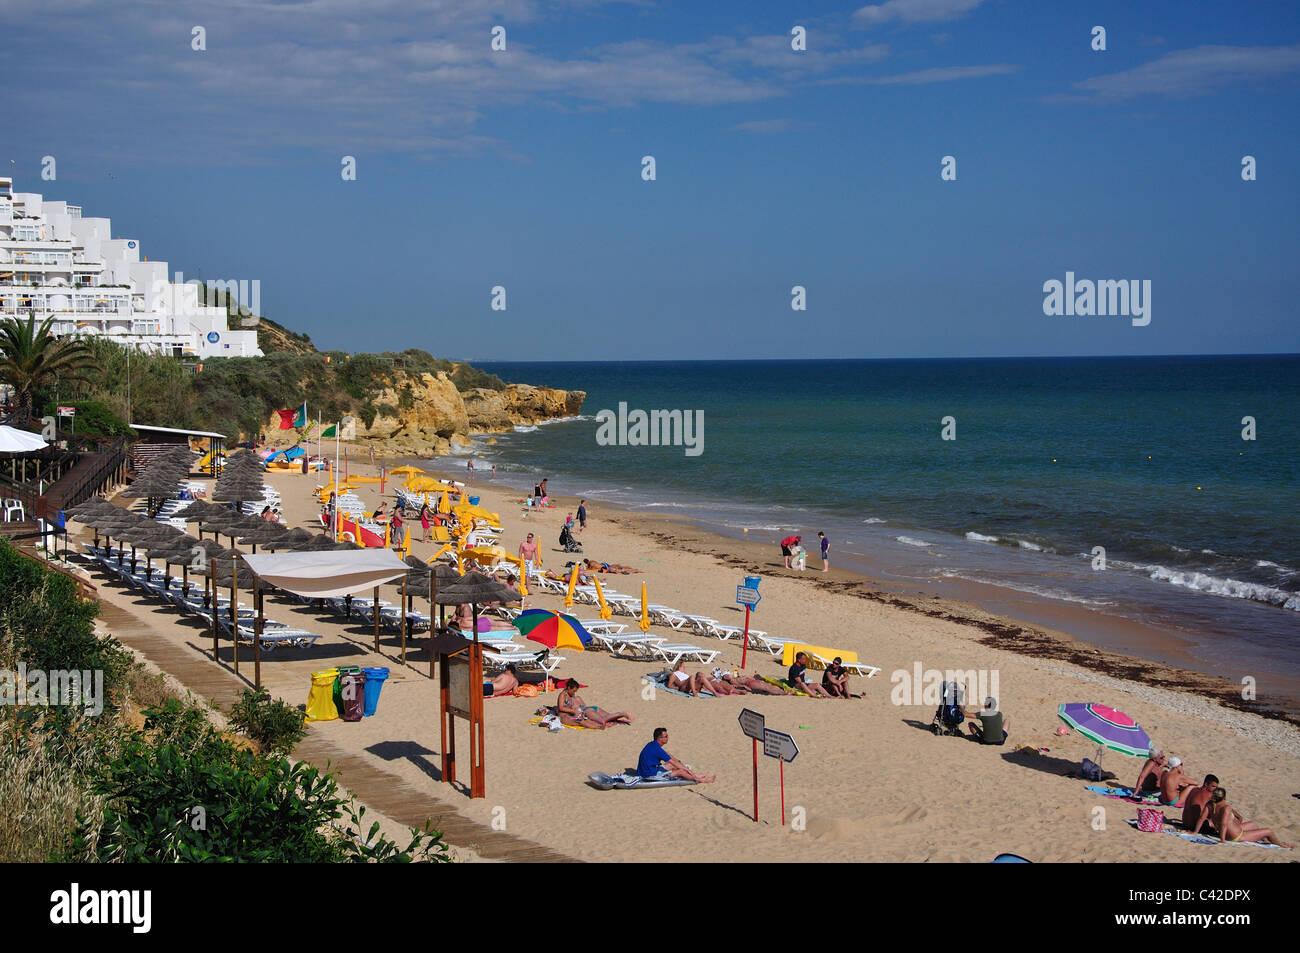 Beach resort view praia da oura faro district algarve region portugal